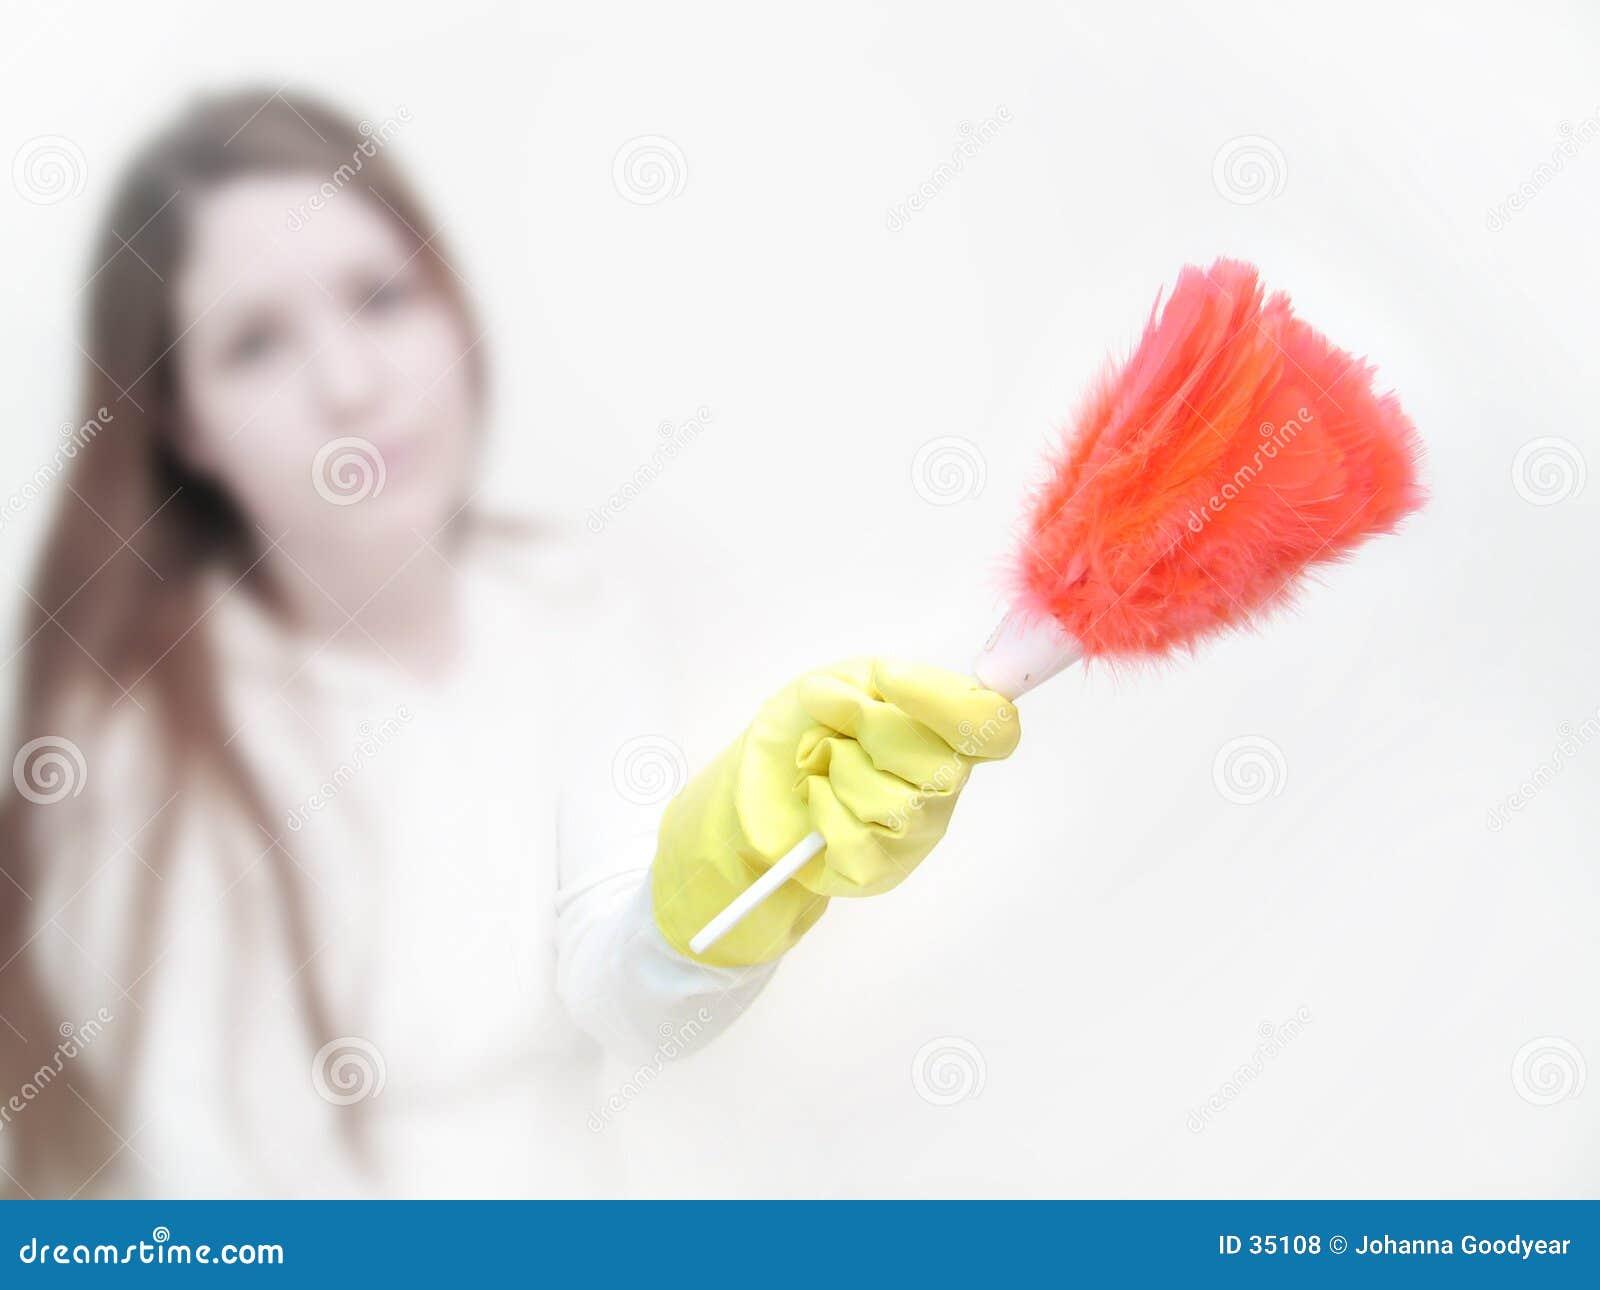 Housework 4